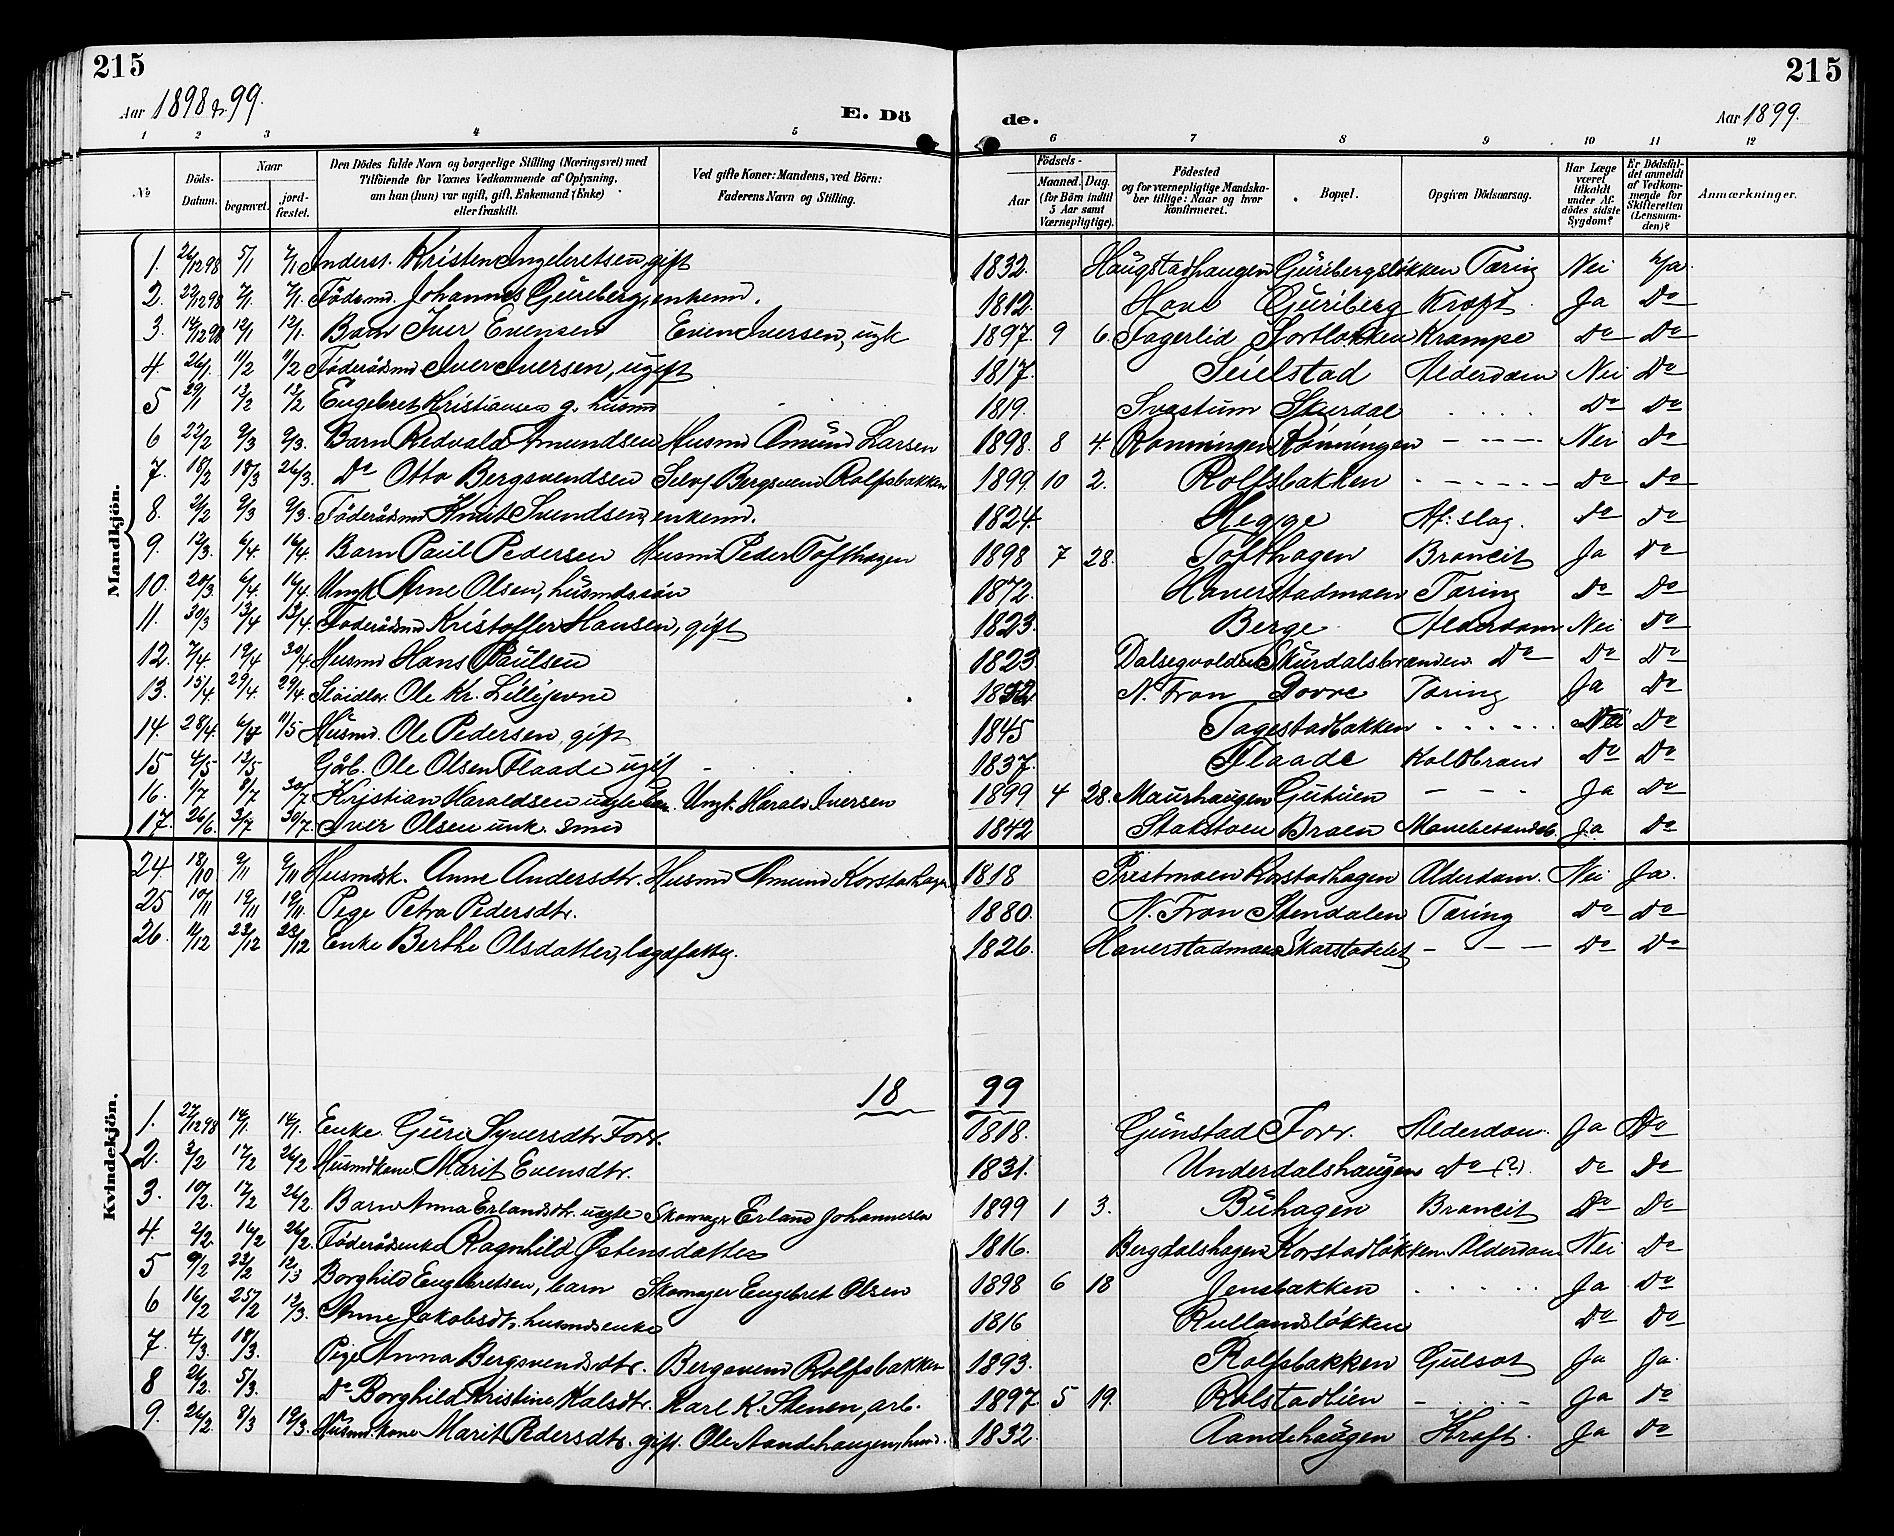 SAH, Sør-Fron prestekontor, H/Ha/Hab/L0004: Klokkerbok nr. 4, 1896-1911, s. 215